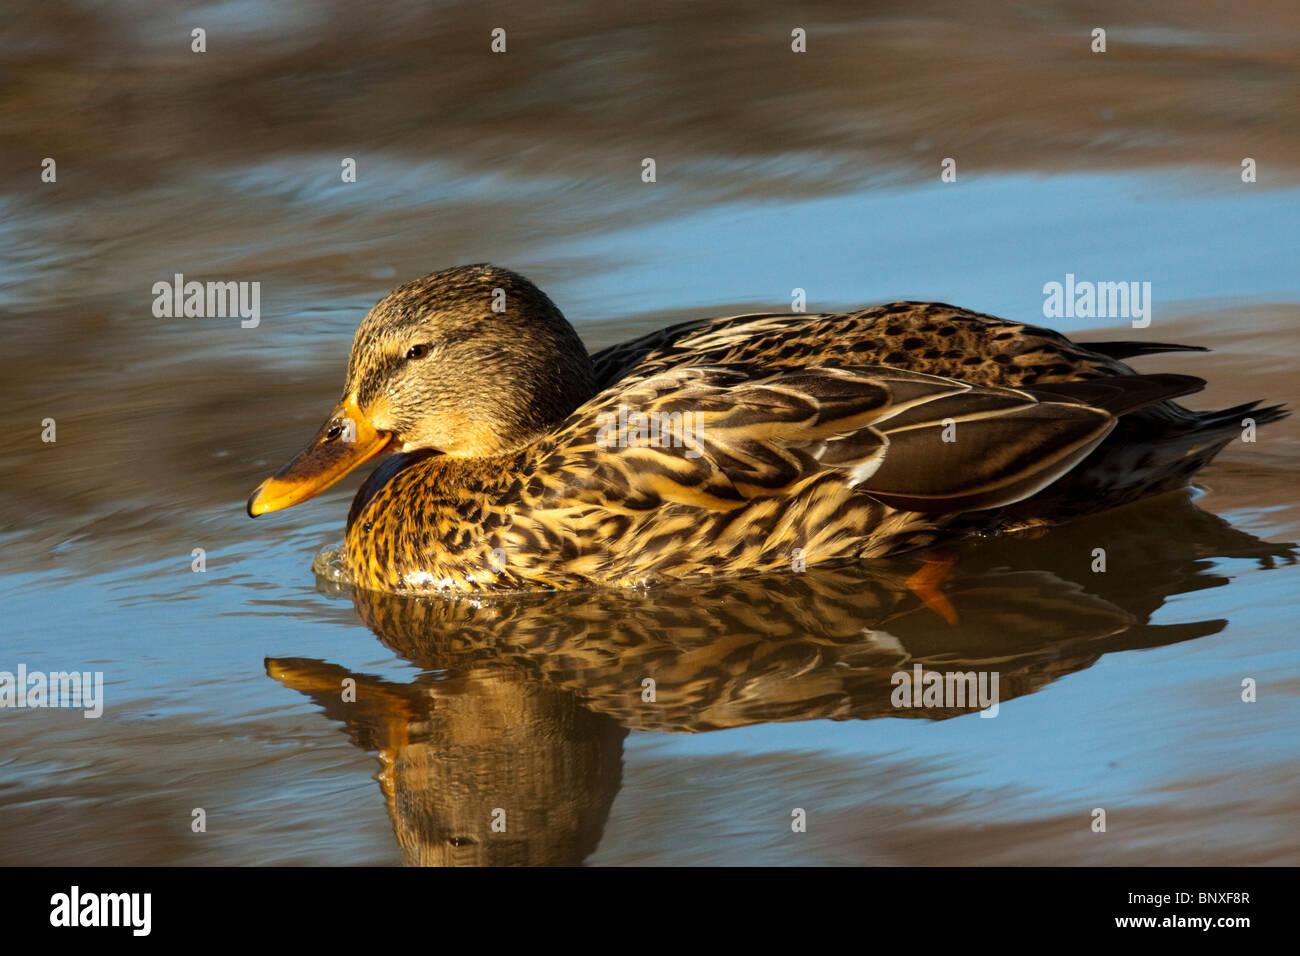 Female mallard duck, Anas platyrhynchos, floating on water - Stock Image